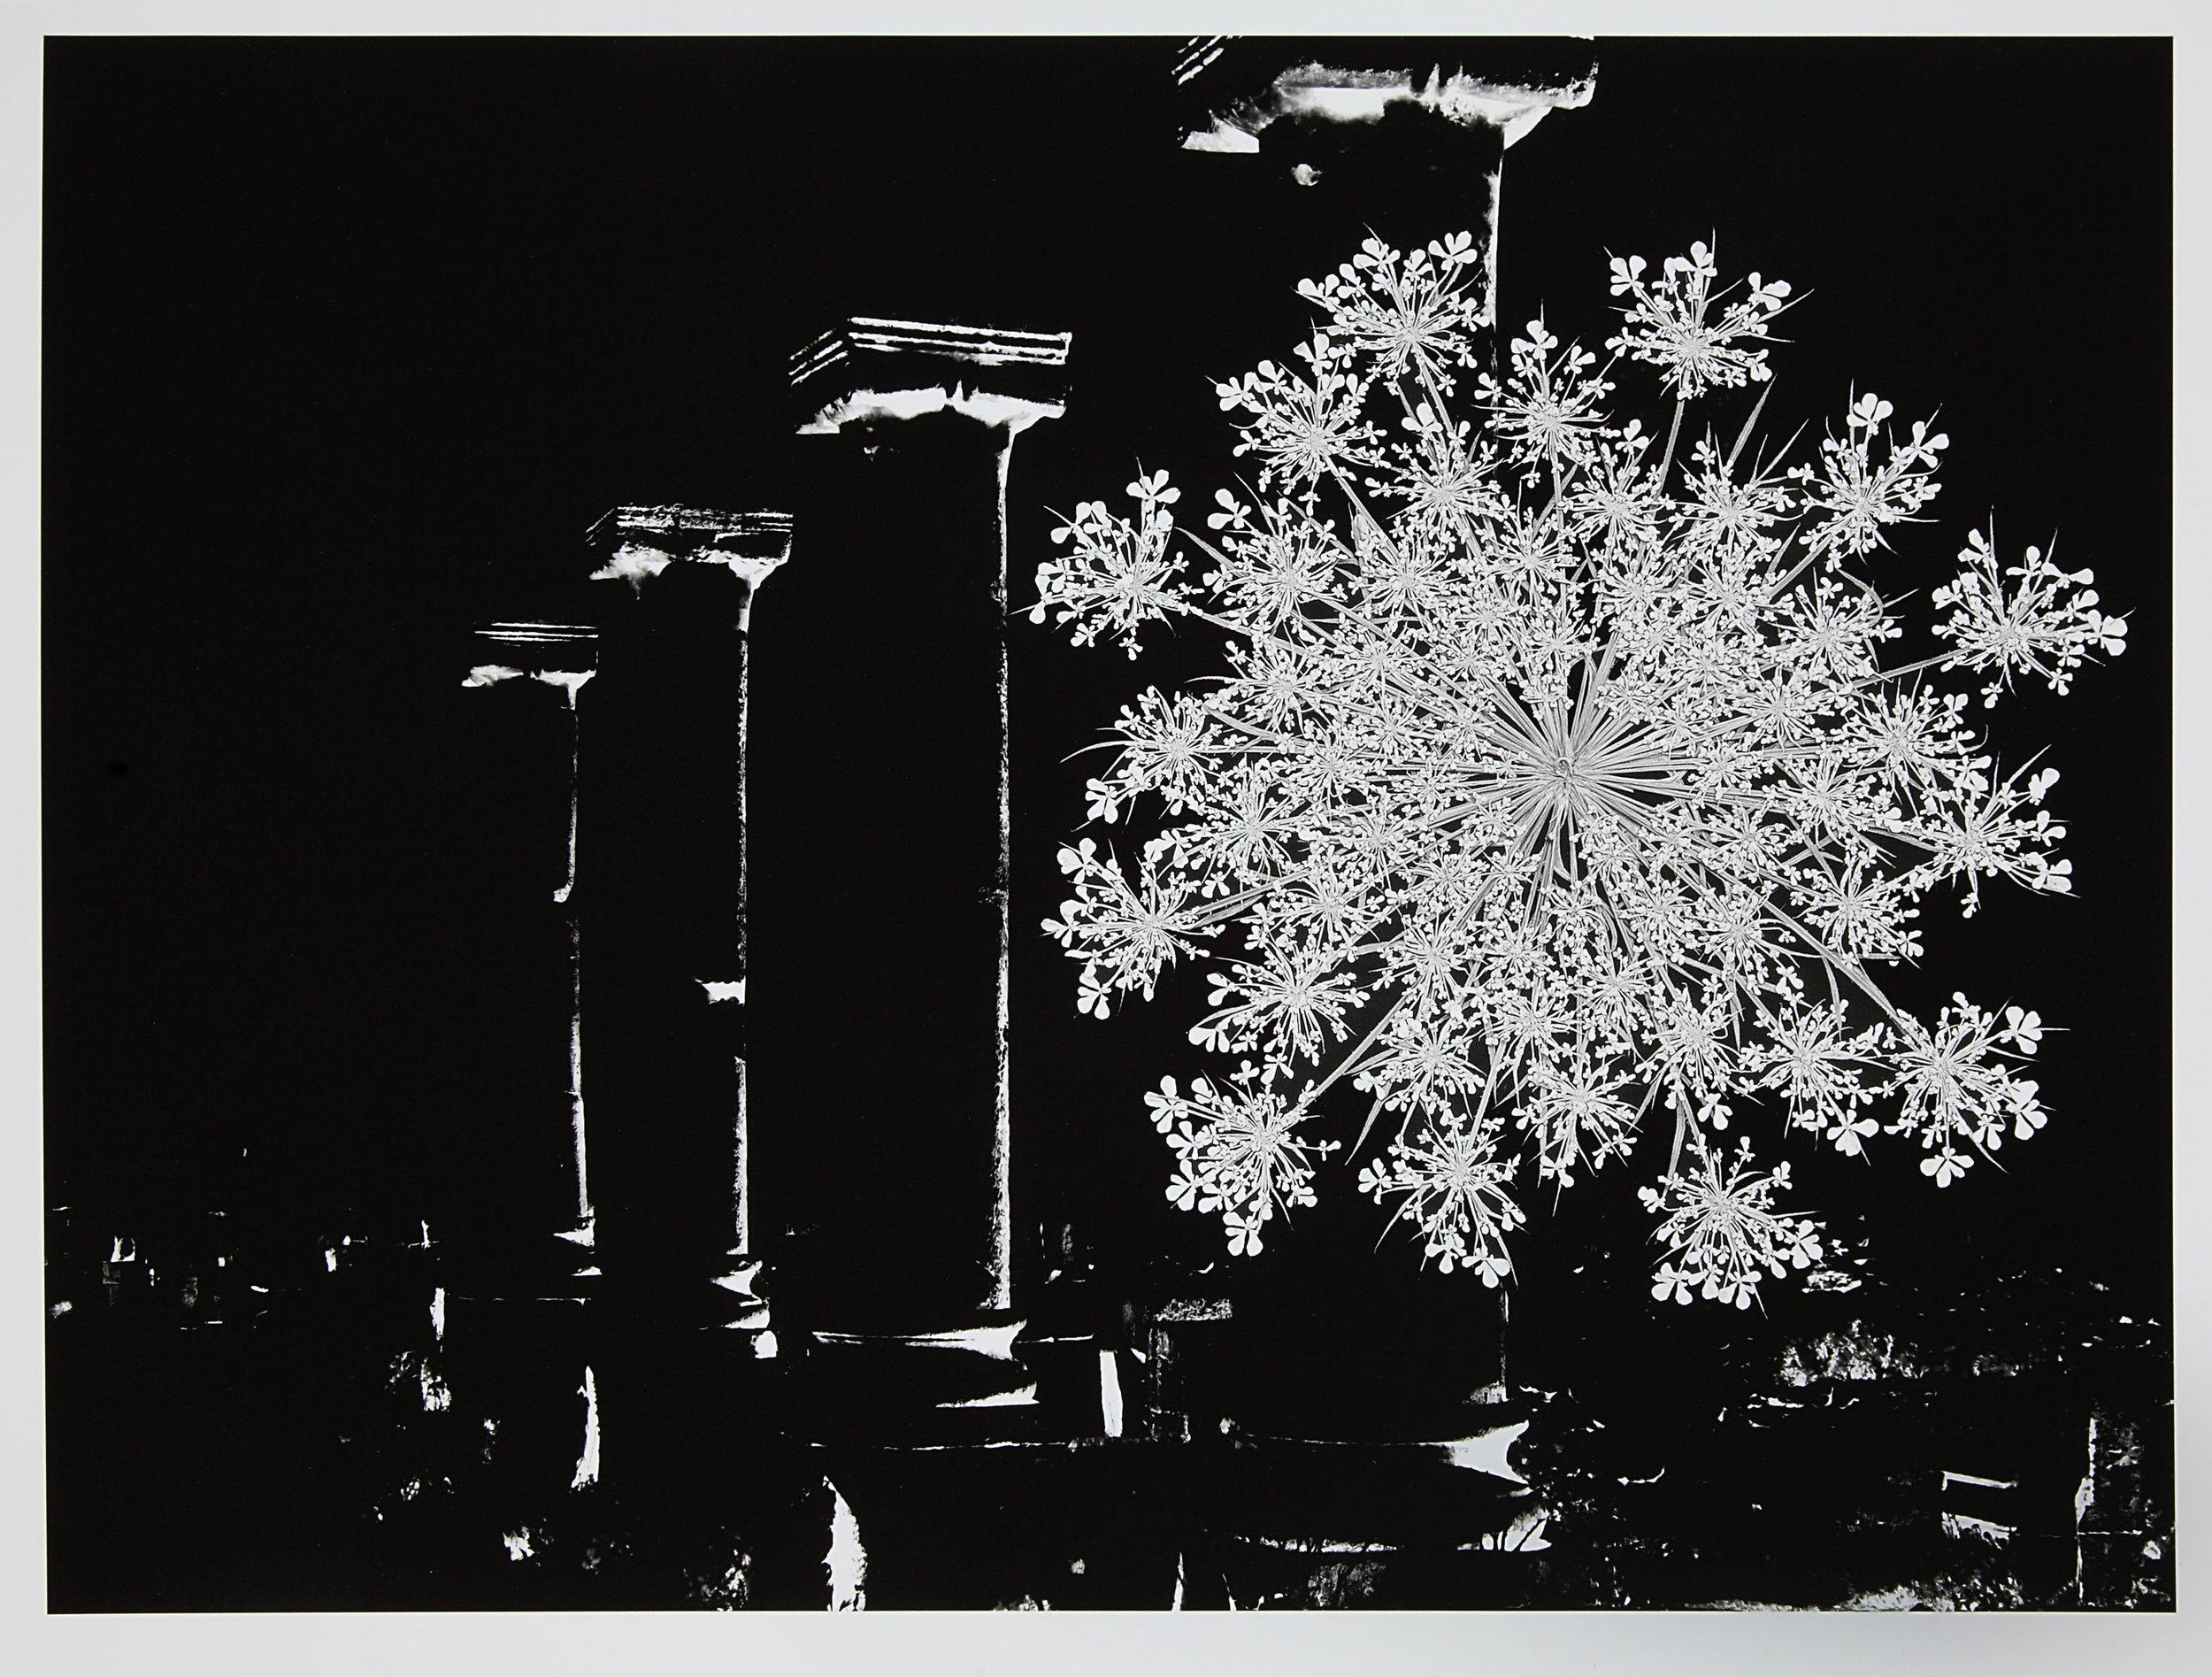 Barbara Goodbody,  Shared Memories  portfolio, 2012, 3/5, Ink jet print, 19.5 x 14 inches